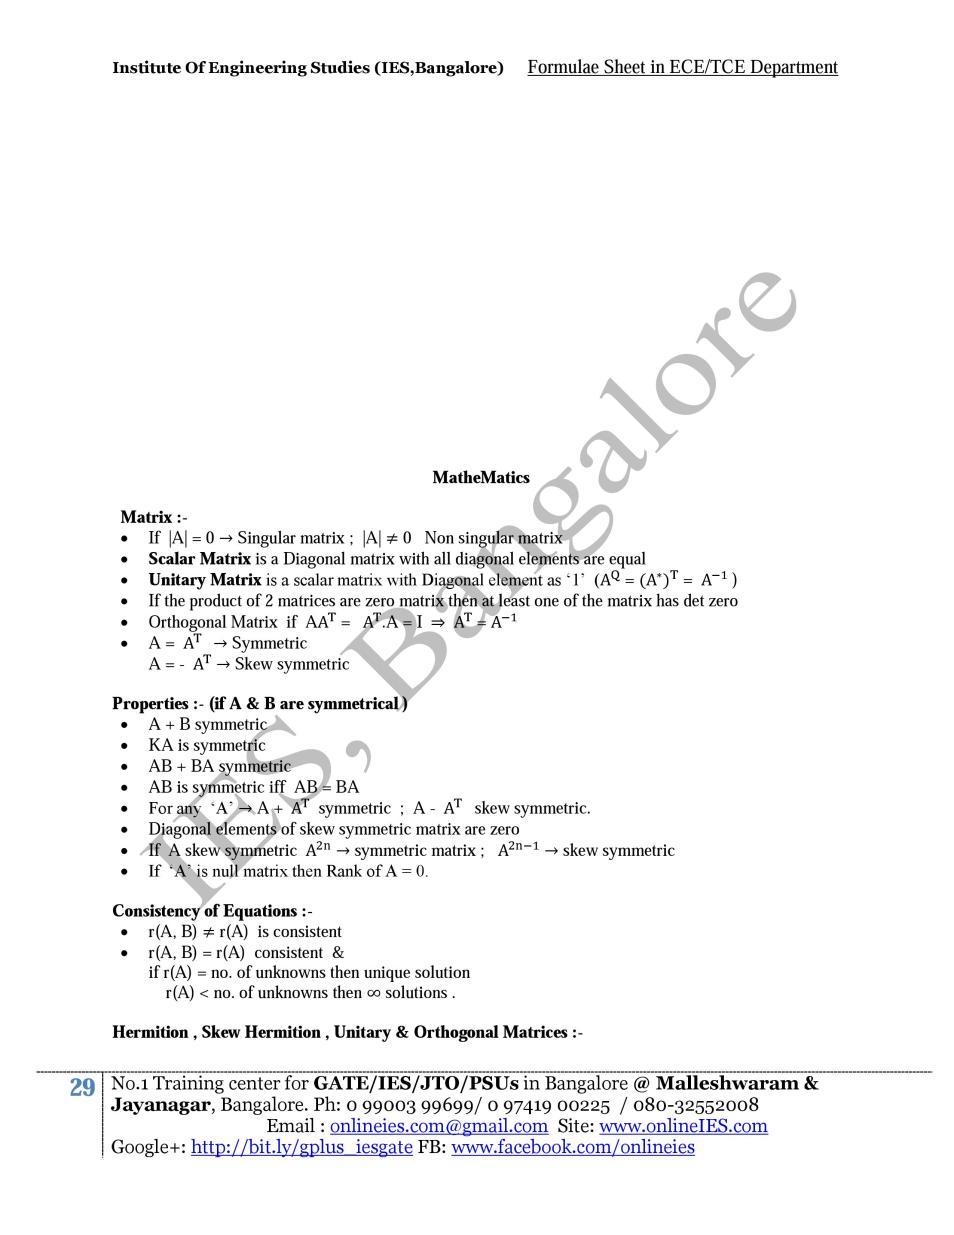 Formula sheet - Mathematics - Gateway of Engineering